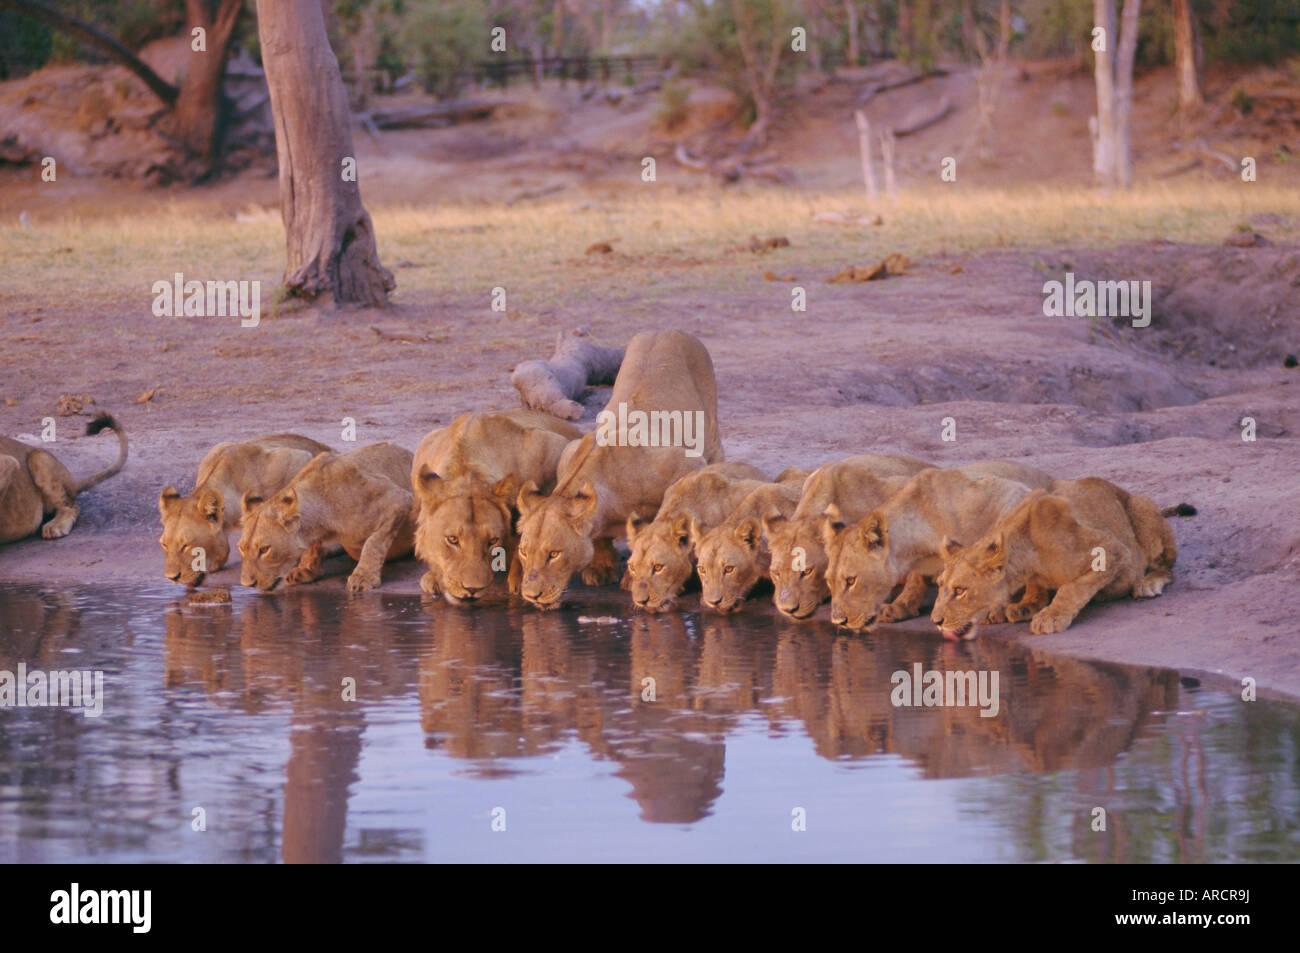 Lion (Panthera leo) at water hole, Okavango Delta, Botswana, Africa - Stock Image